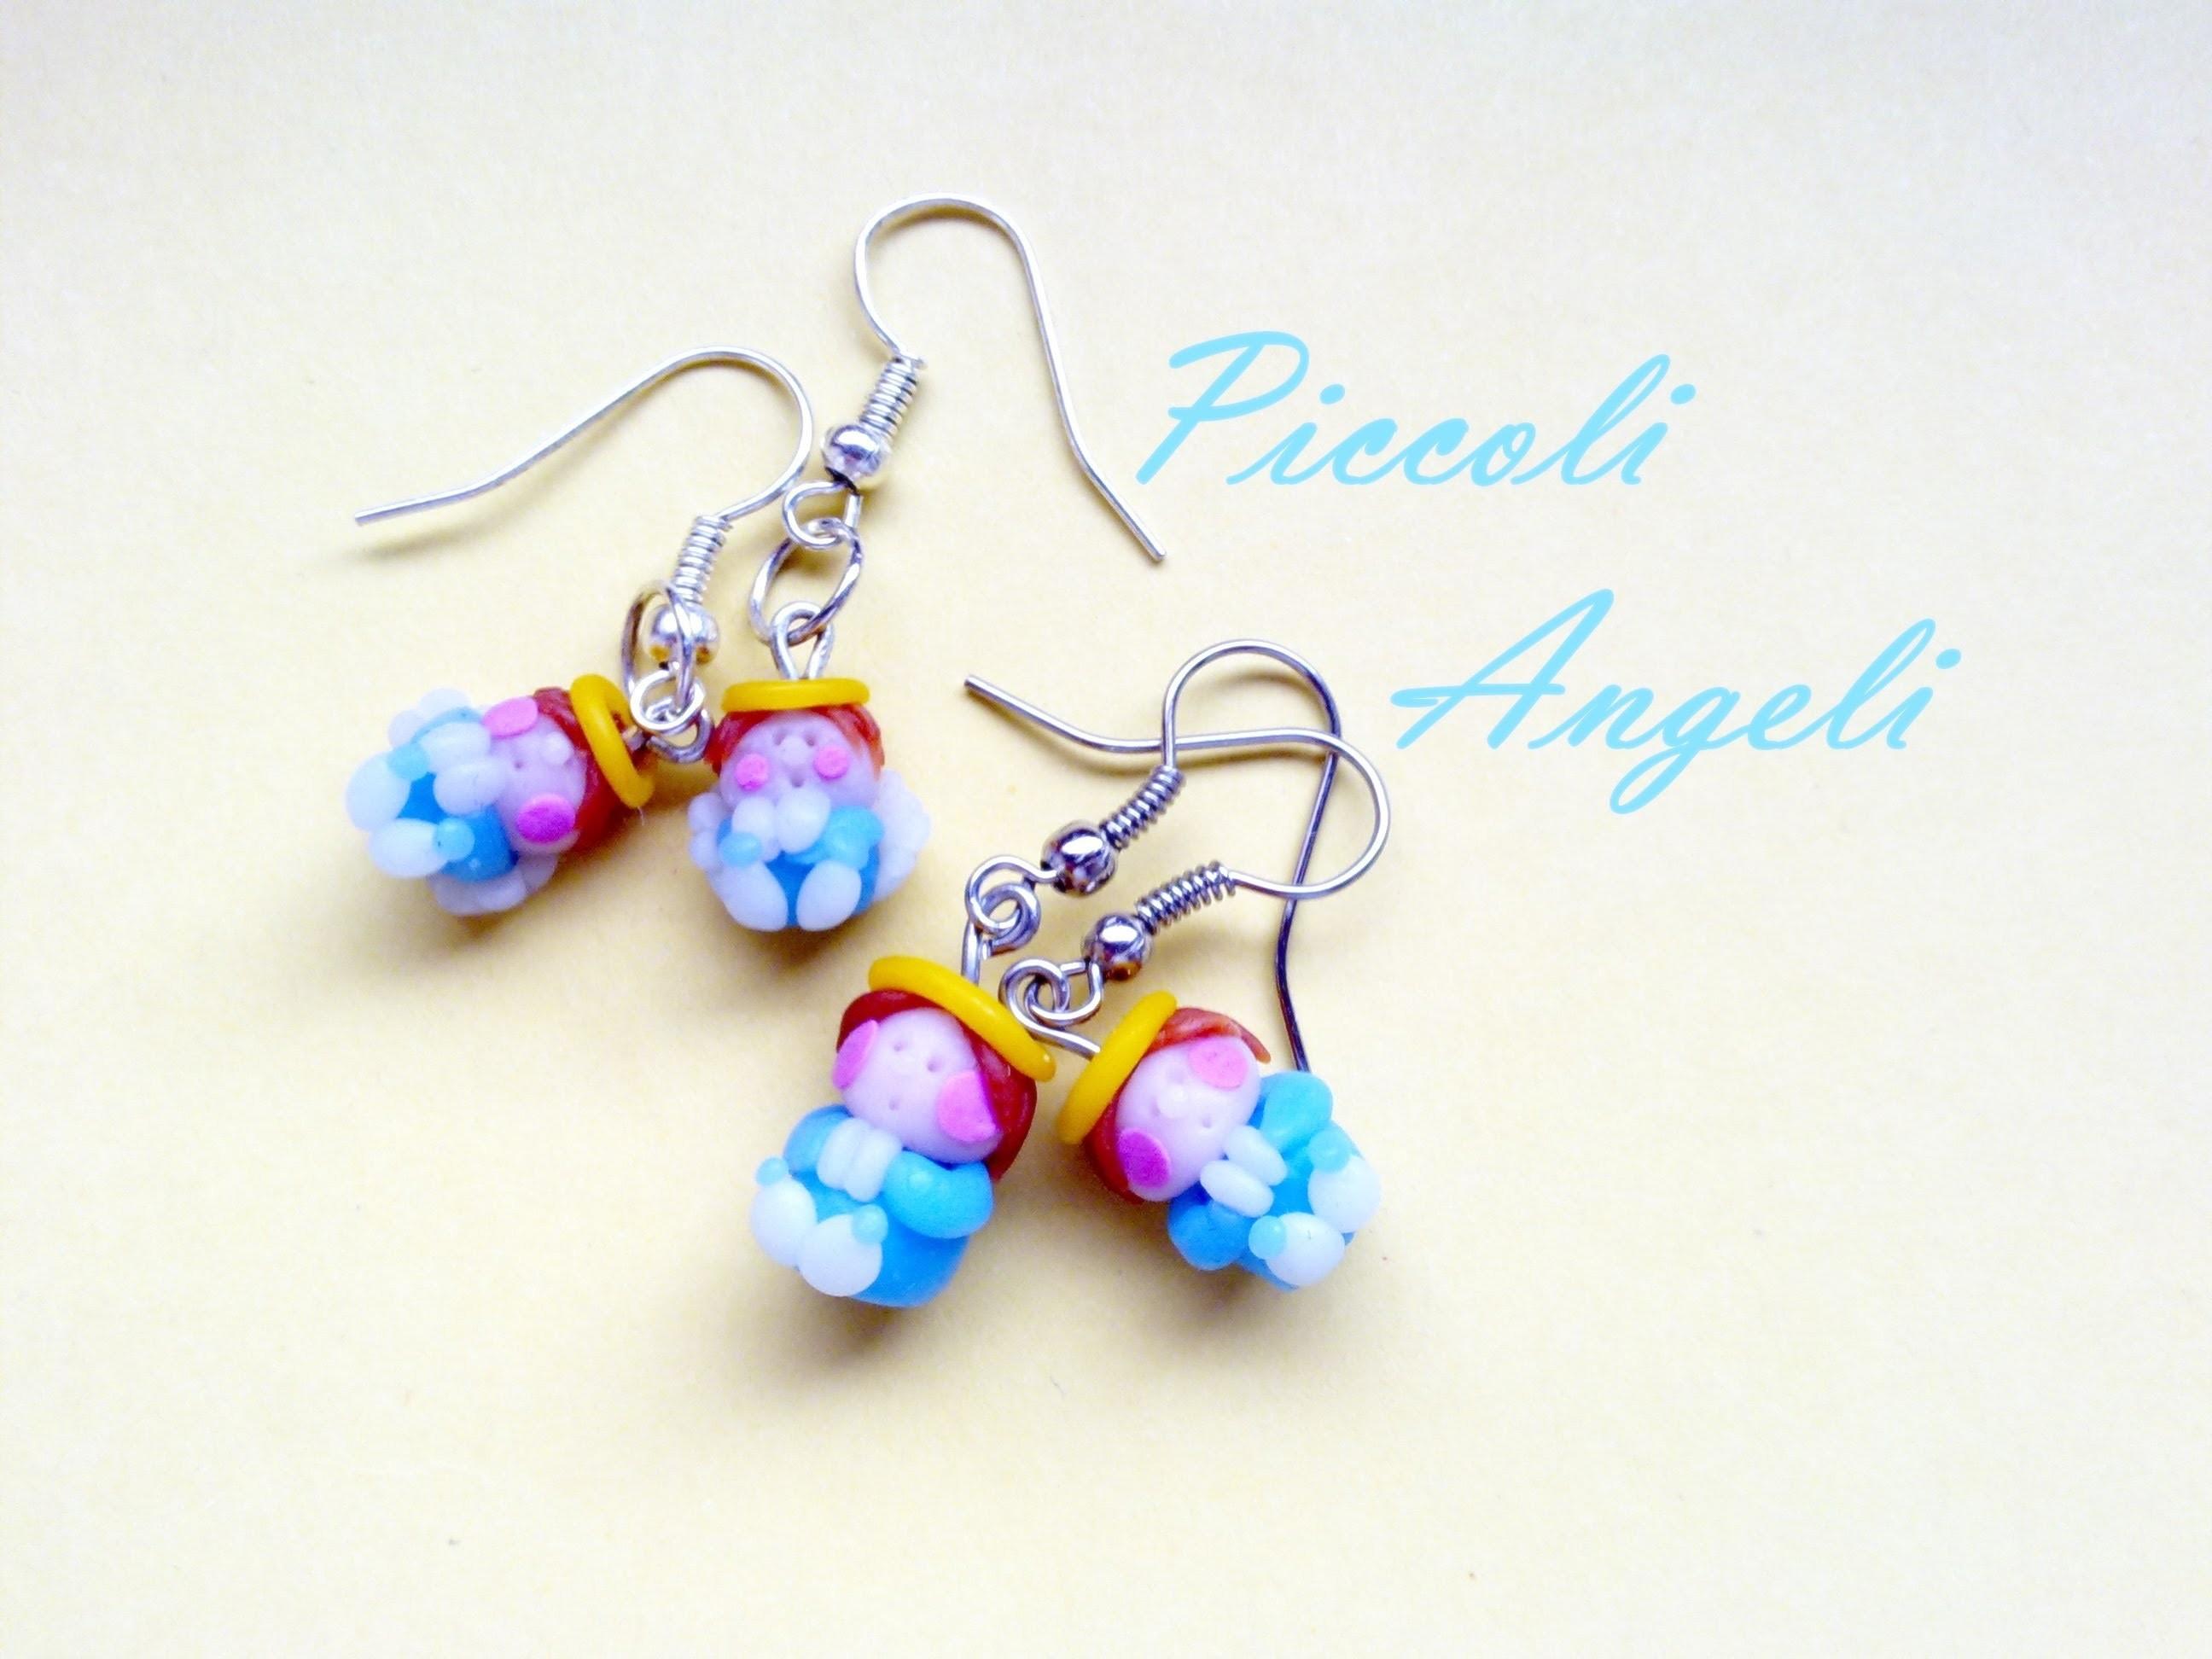 DIY Piccoli Angeli: Orecchini in Cernit  -  Little Angels Earrings (Polymer Clay Tutorial) O:-)